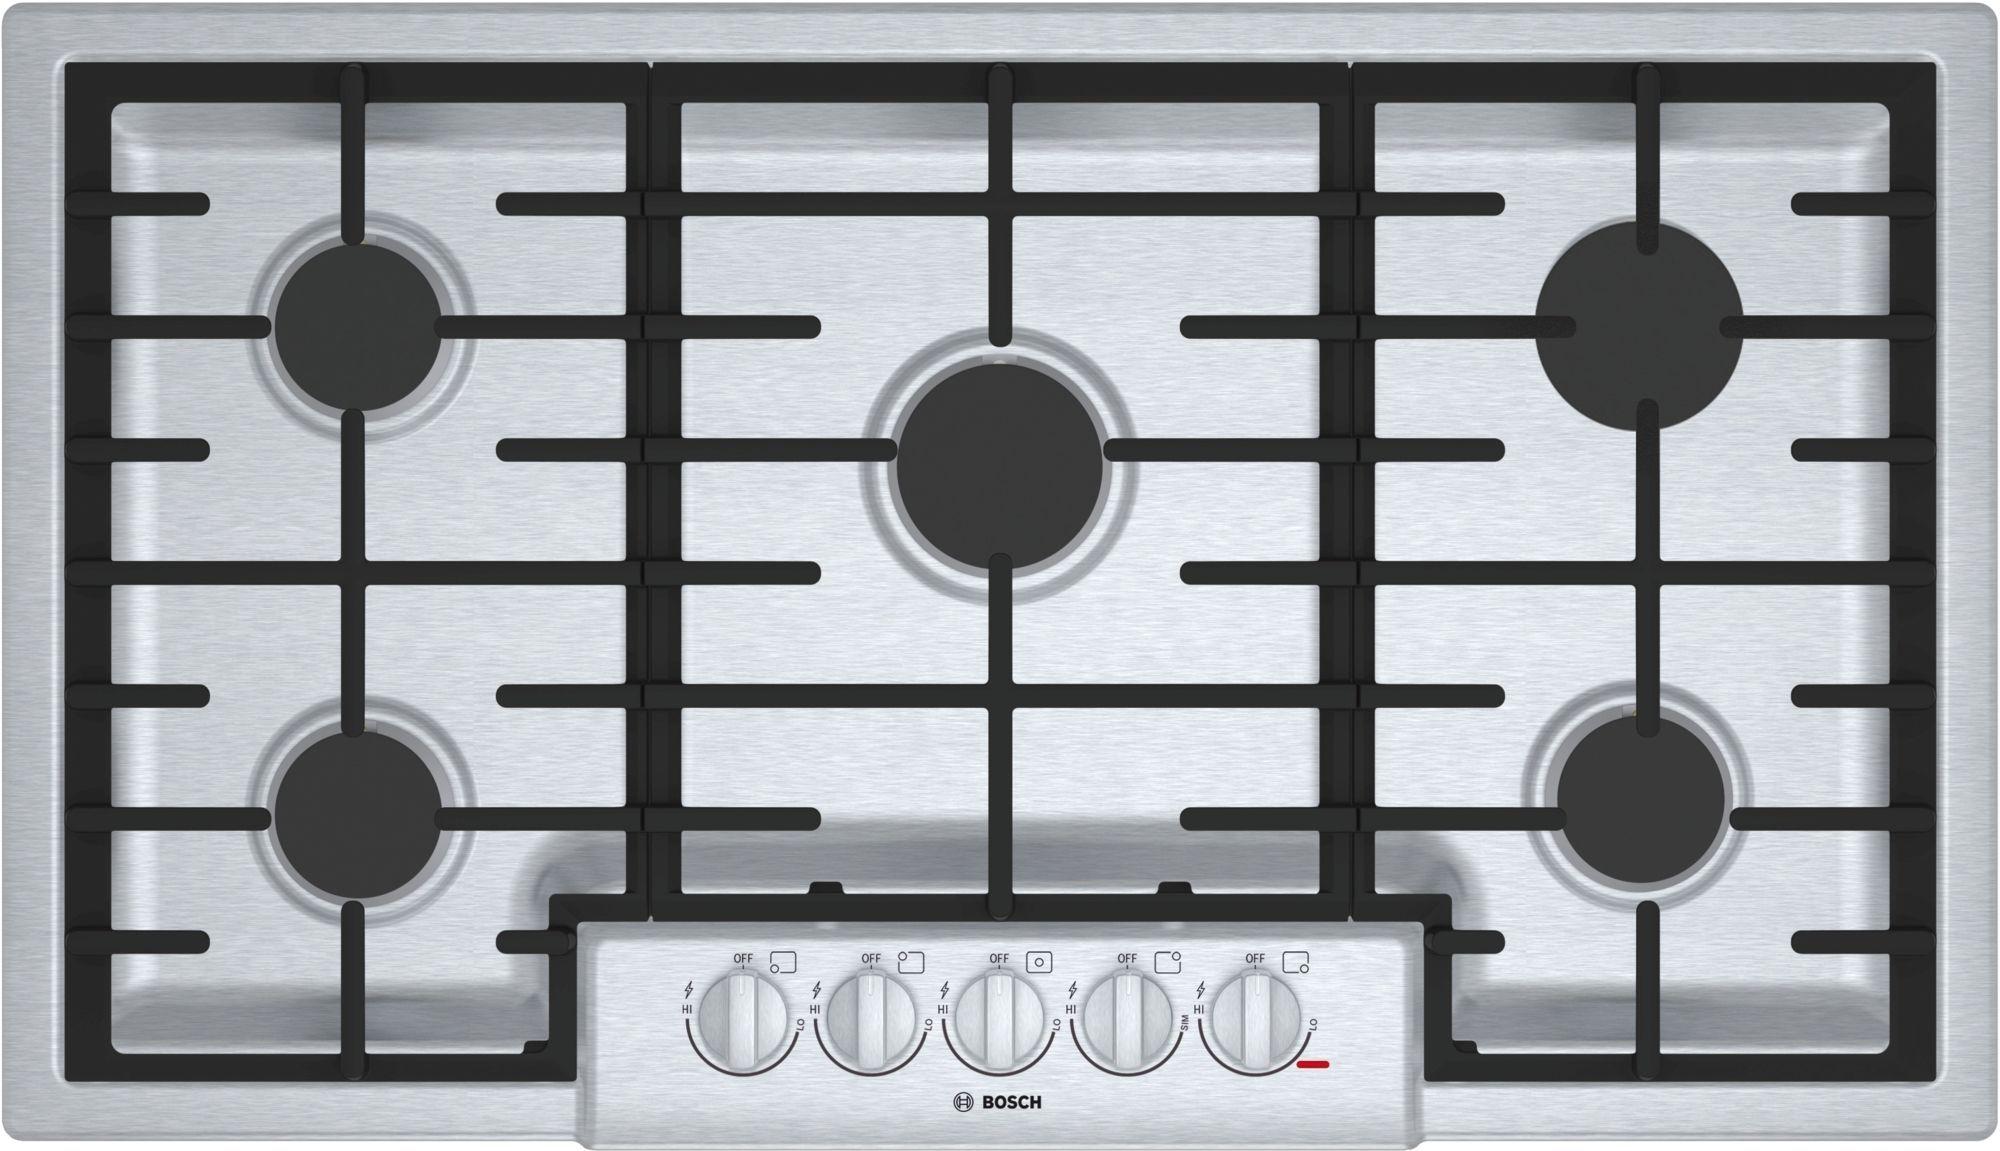 Bosch ngmuc in hot sellers appliances kitchen kitchen